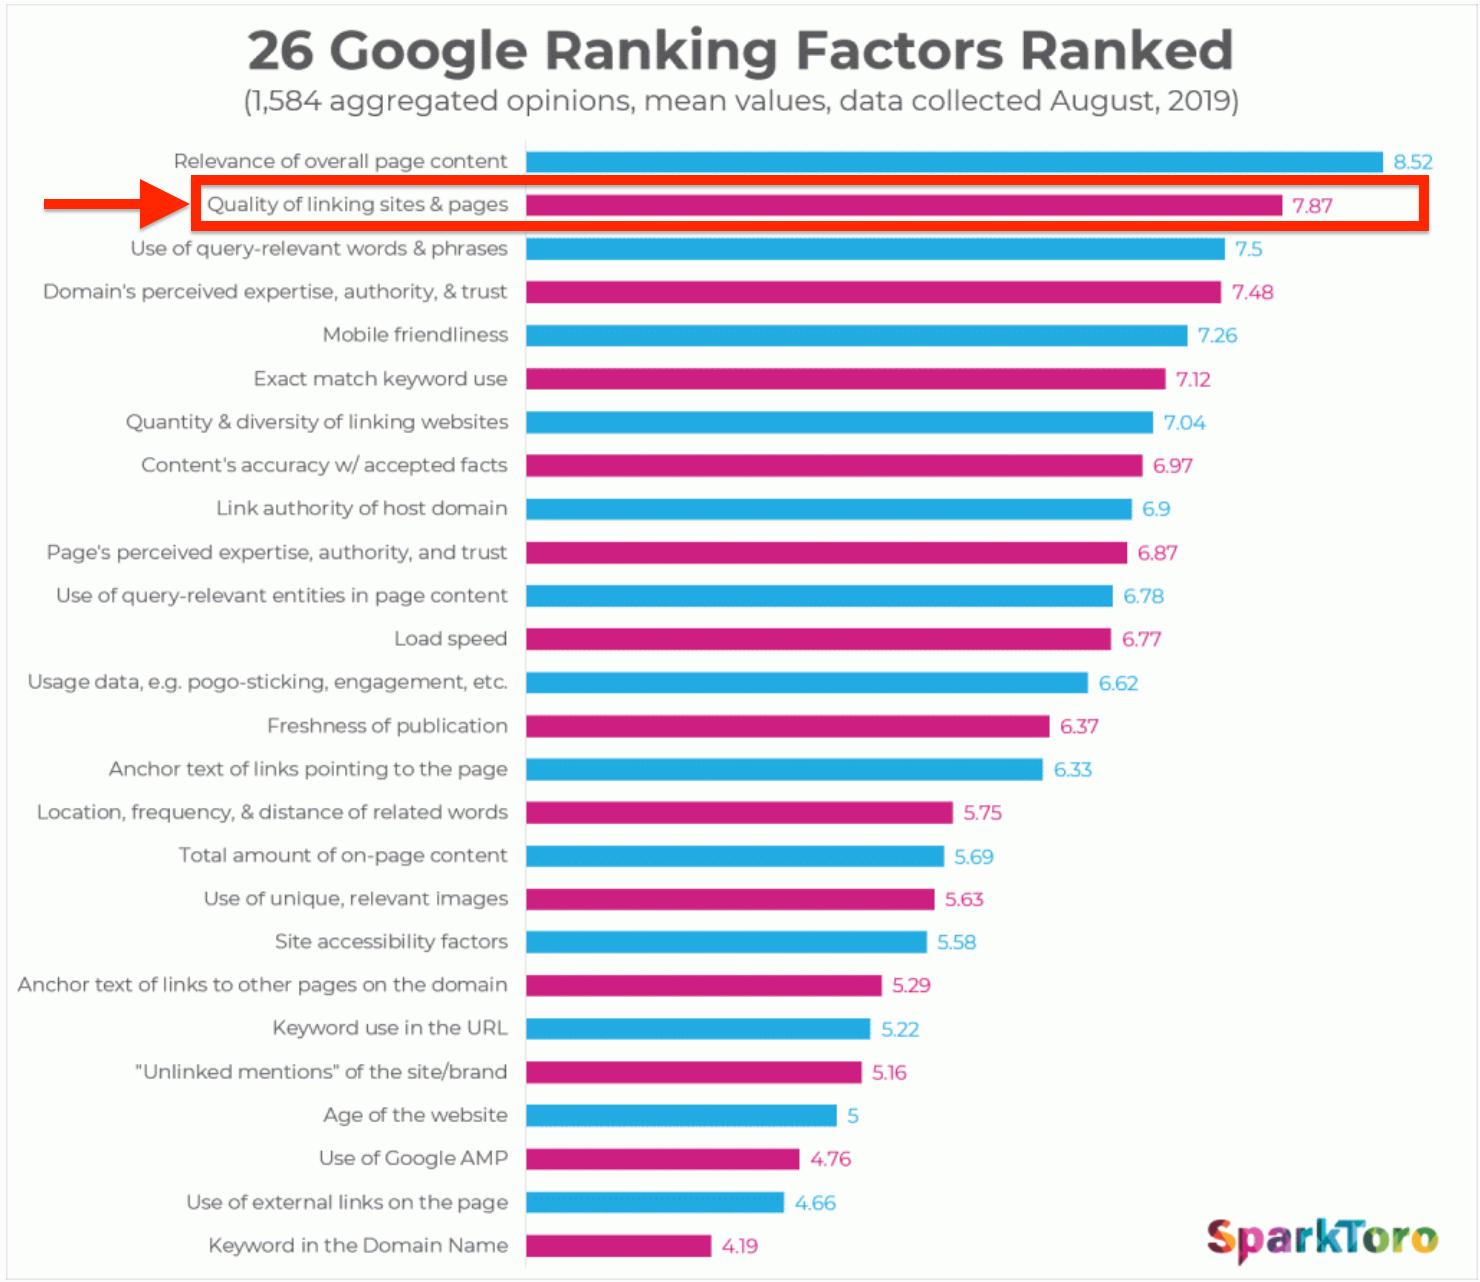 Sparktoro Google Ranking Factors